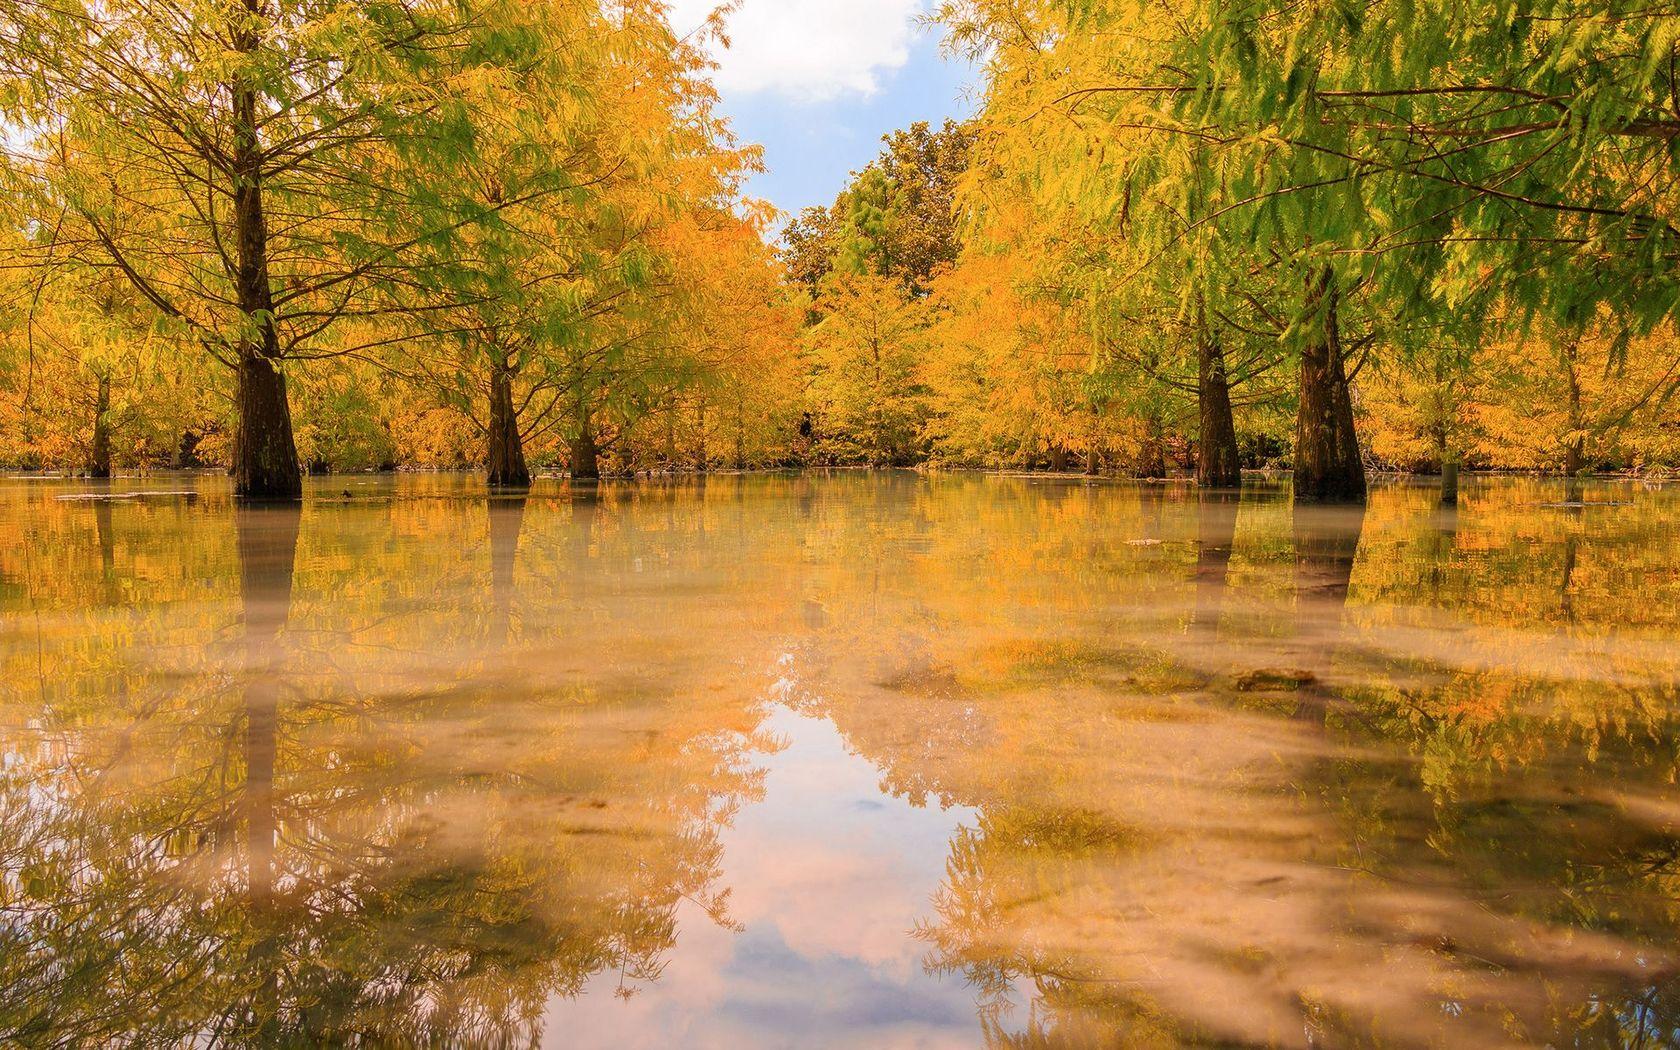 Fall Wallpaper And Screensavers For Free Swamp Wallpaper Autumn Fall Hd Desktop Wallpapers 4k Hd